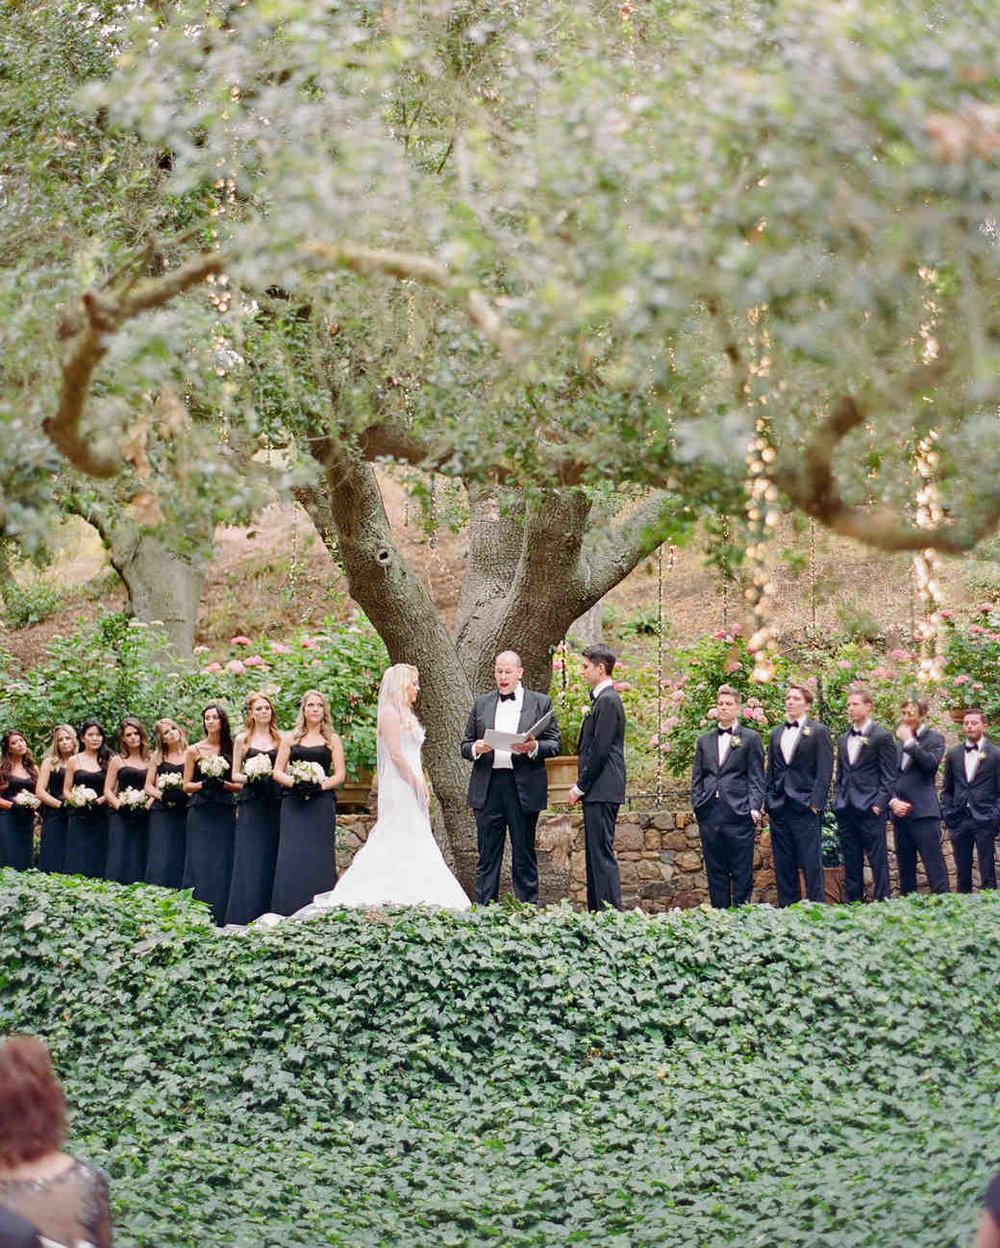 shannon-jon-wedding-ceremony-0488-6238579-0117_vert.jpg